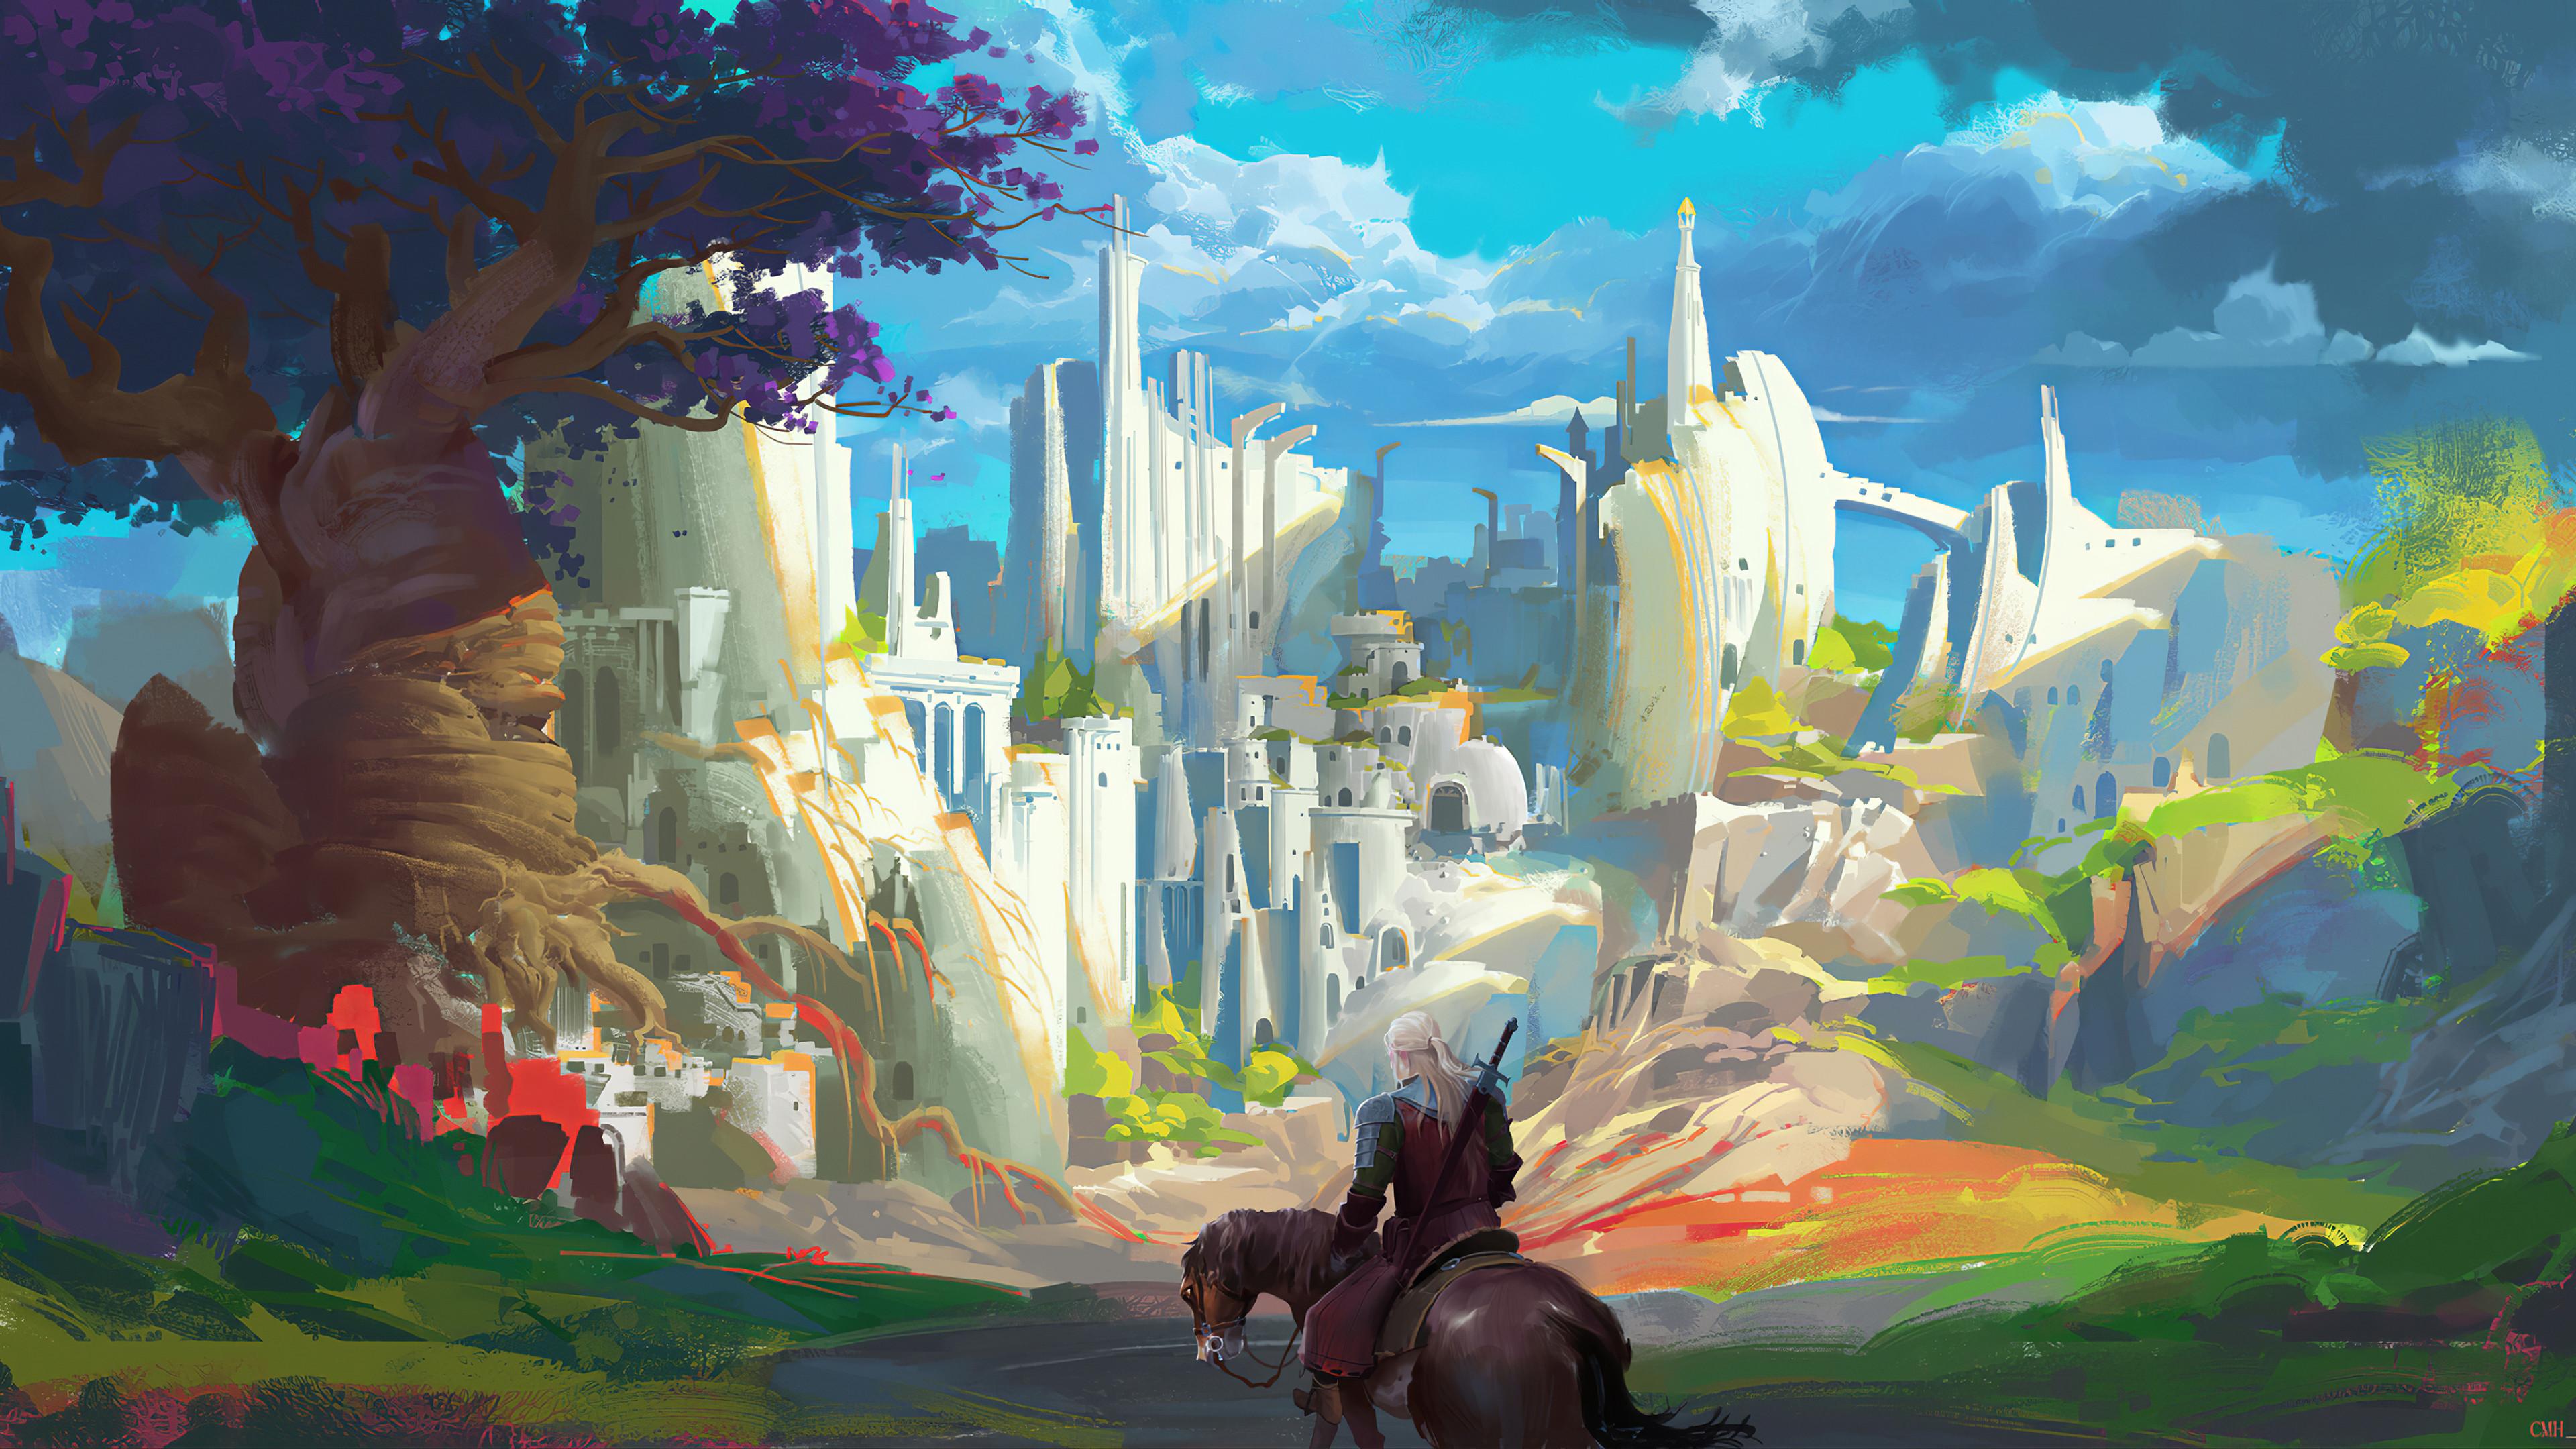 geralt of rivia the witcher 3 wild hunt 2019 4k tv 3840x2160 1 - Witcher 3 Wild Hunt : Geralt Of Rivia Art - Witcher 3 game art wallpaper 4k, Witcher 3 4k wallpaper